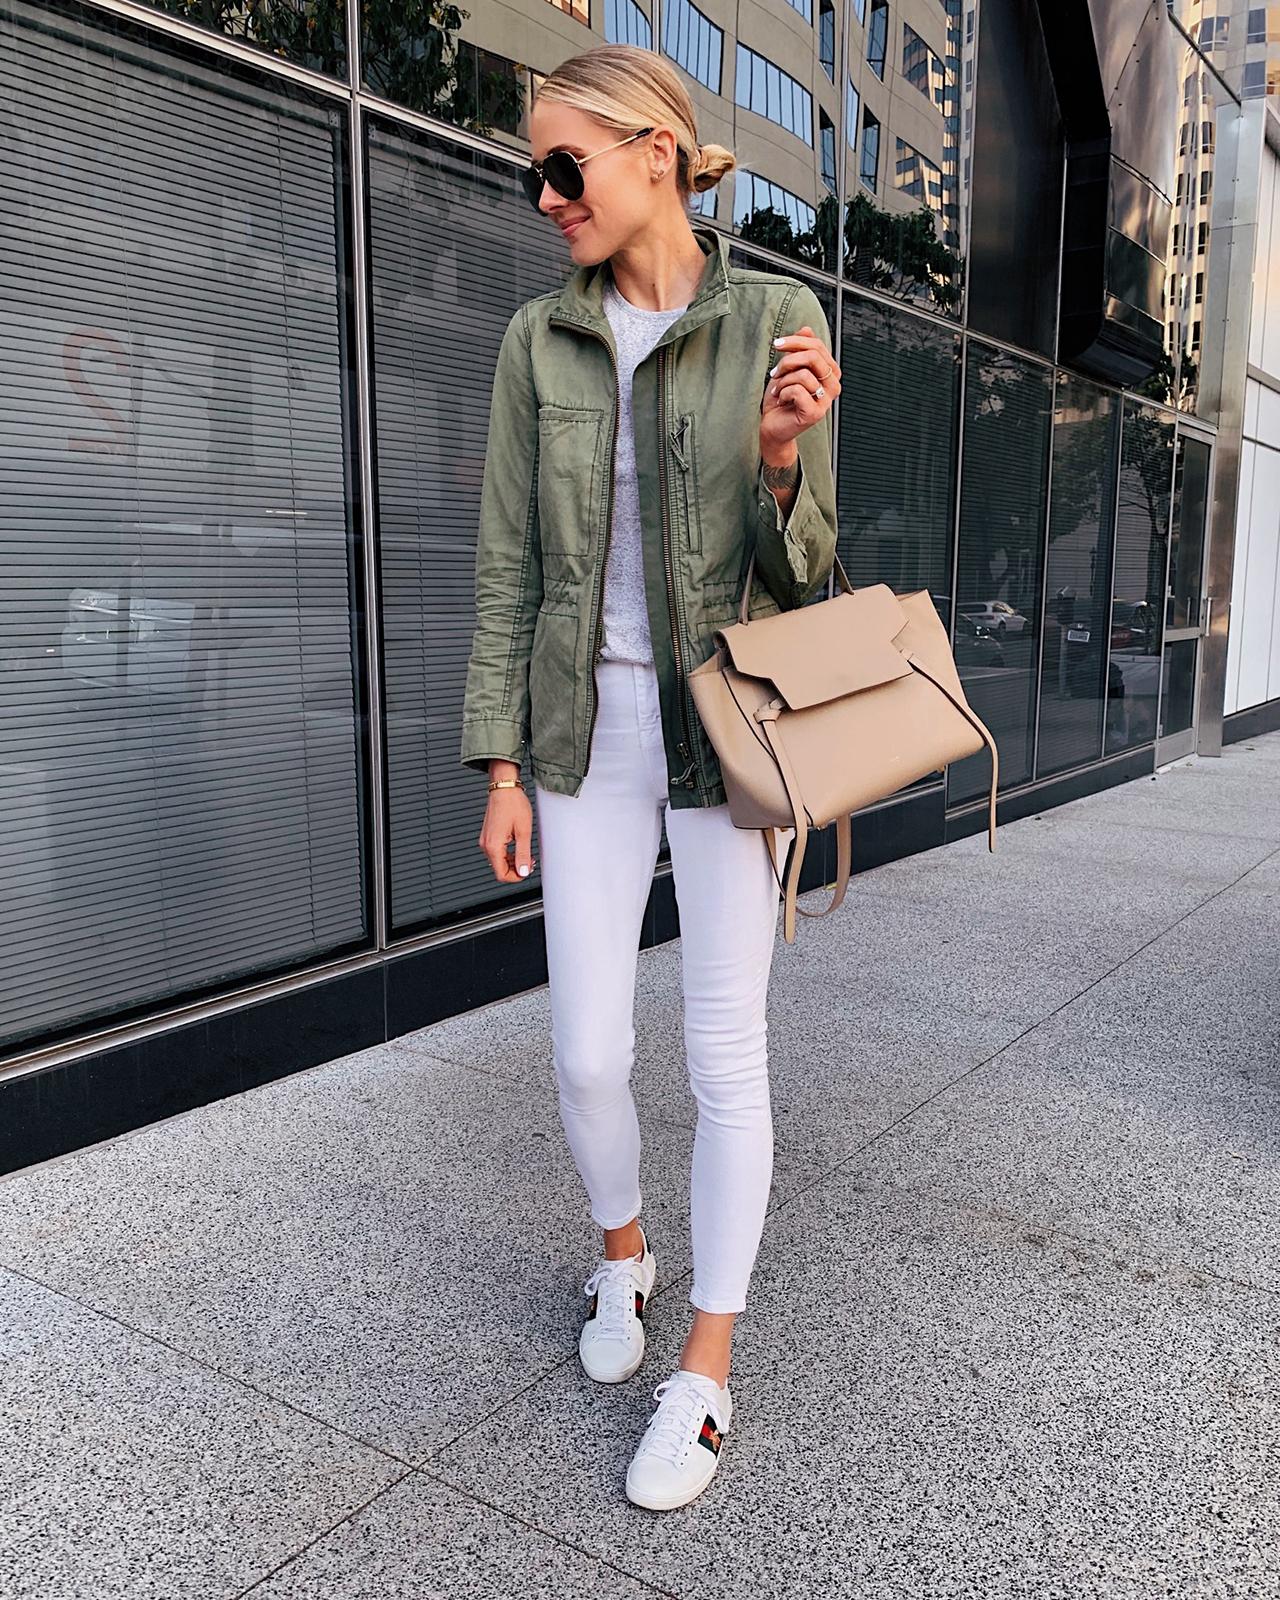 Fashion Jackson Green Utility Jacket Grey Tshirt White Skinny Jeans Gucci Sneakers Celine Mini Belt Bag